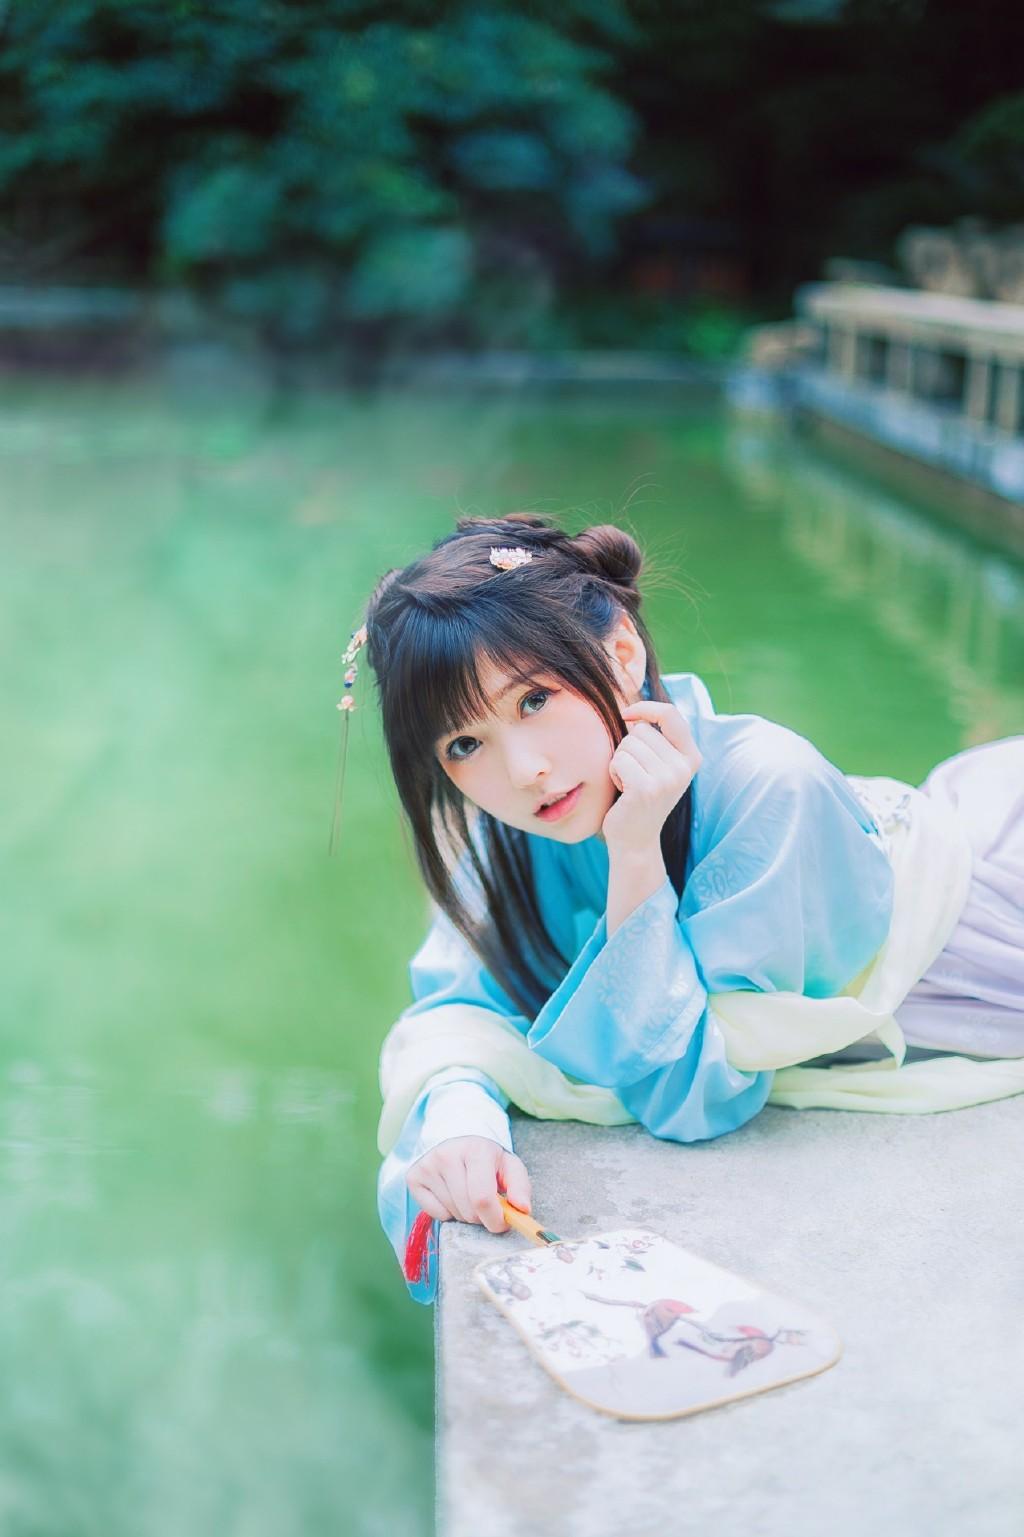 【Cosplay】日本cosplay2019-11-18-小柚妹站